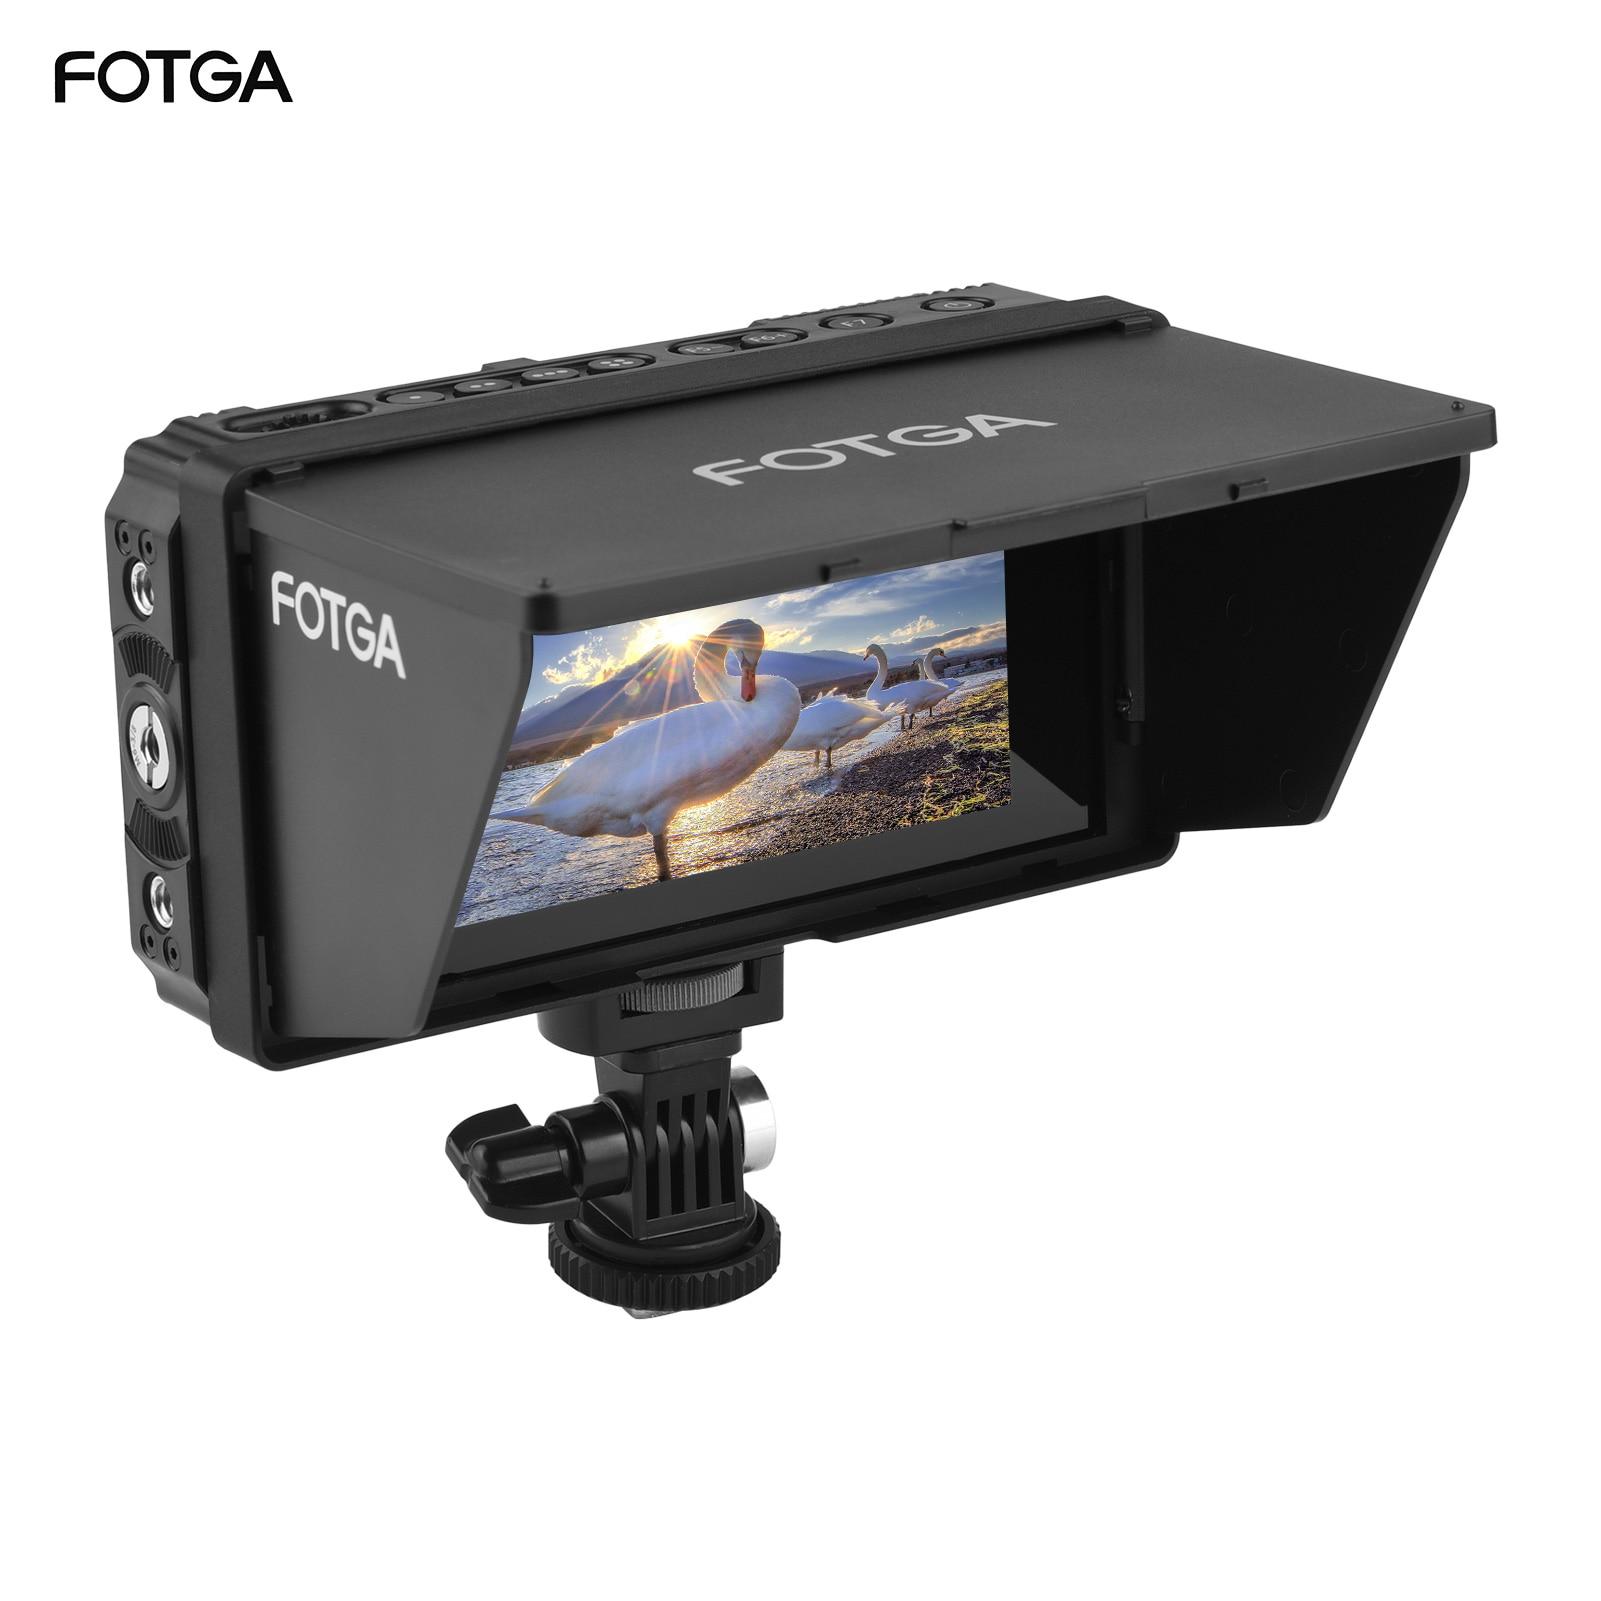 Fotga E50S 4K 5 بوصة رصد على الكاميرا جهاز المراقبة الميدانية التي تعمل باللمس IPS الشاشة 3G-SDI ثلاثية الأبعاد لوت USB ترقية للكاميرا DSLR كاميرا الفيديو